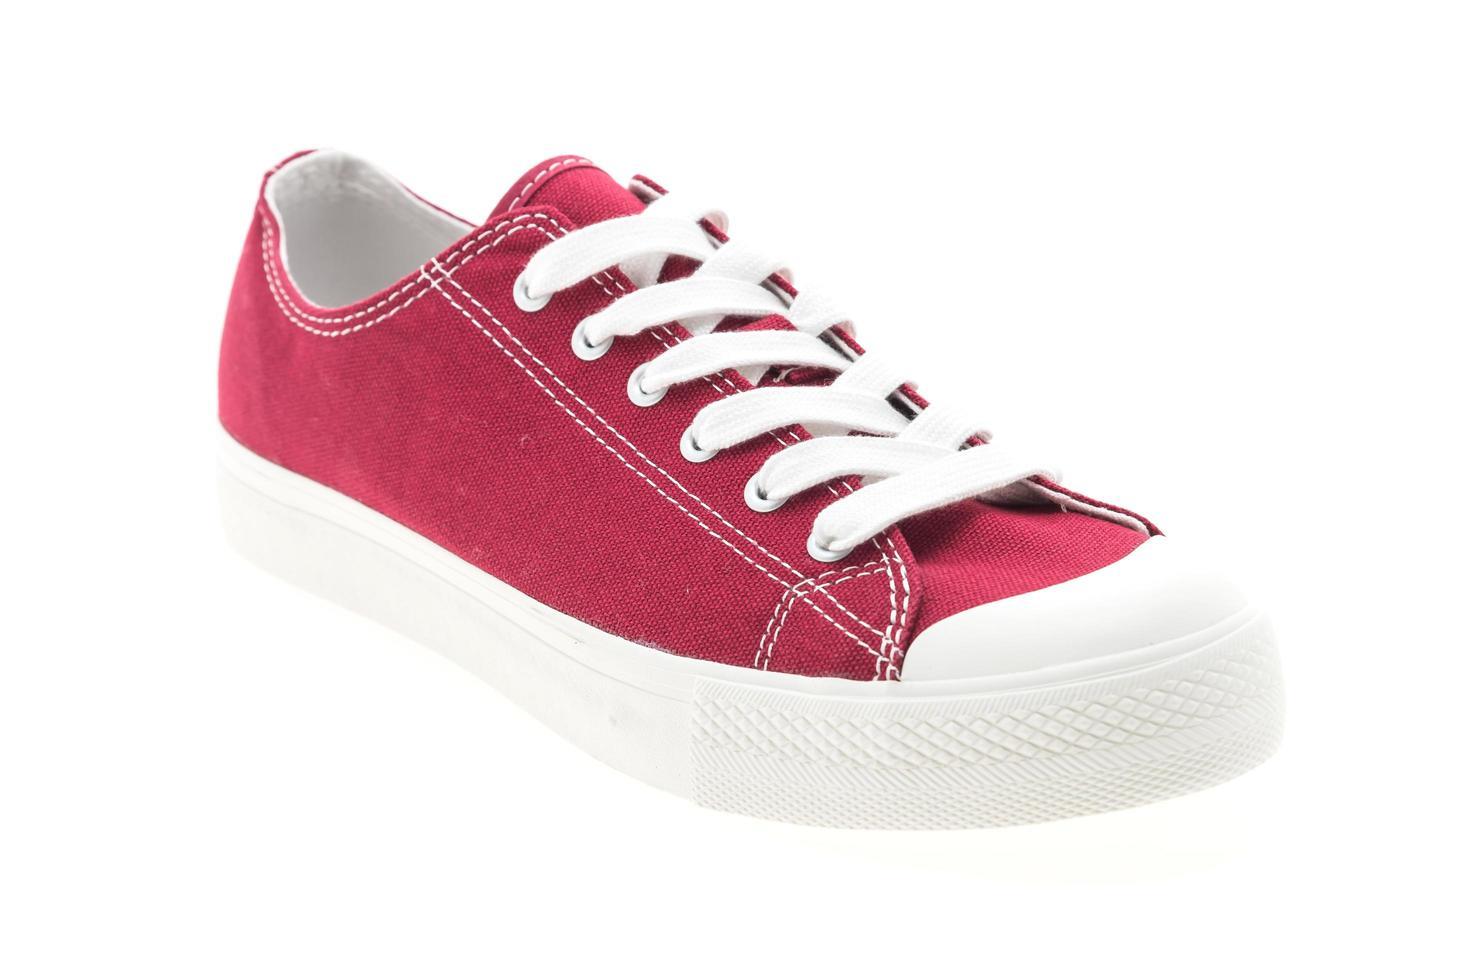 chaussure rouge sur fond blanc photo